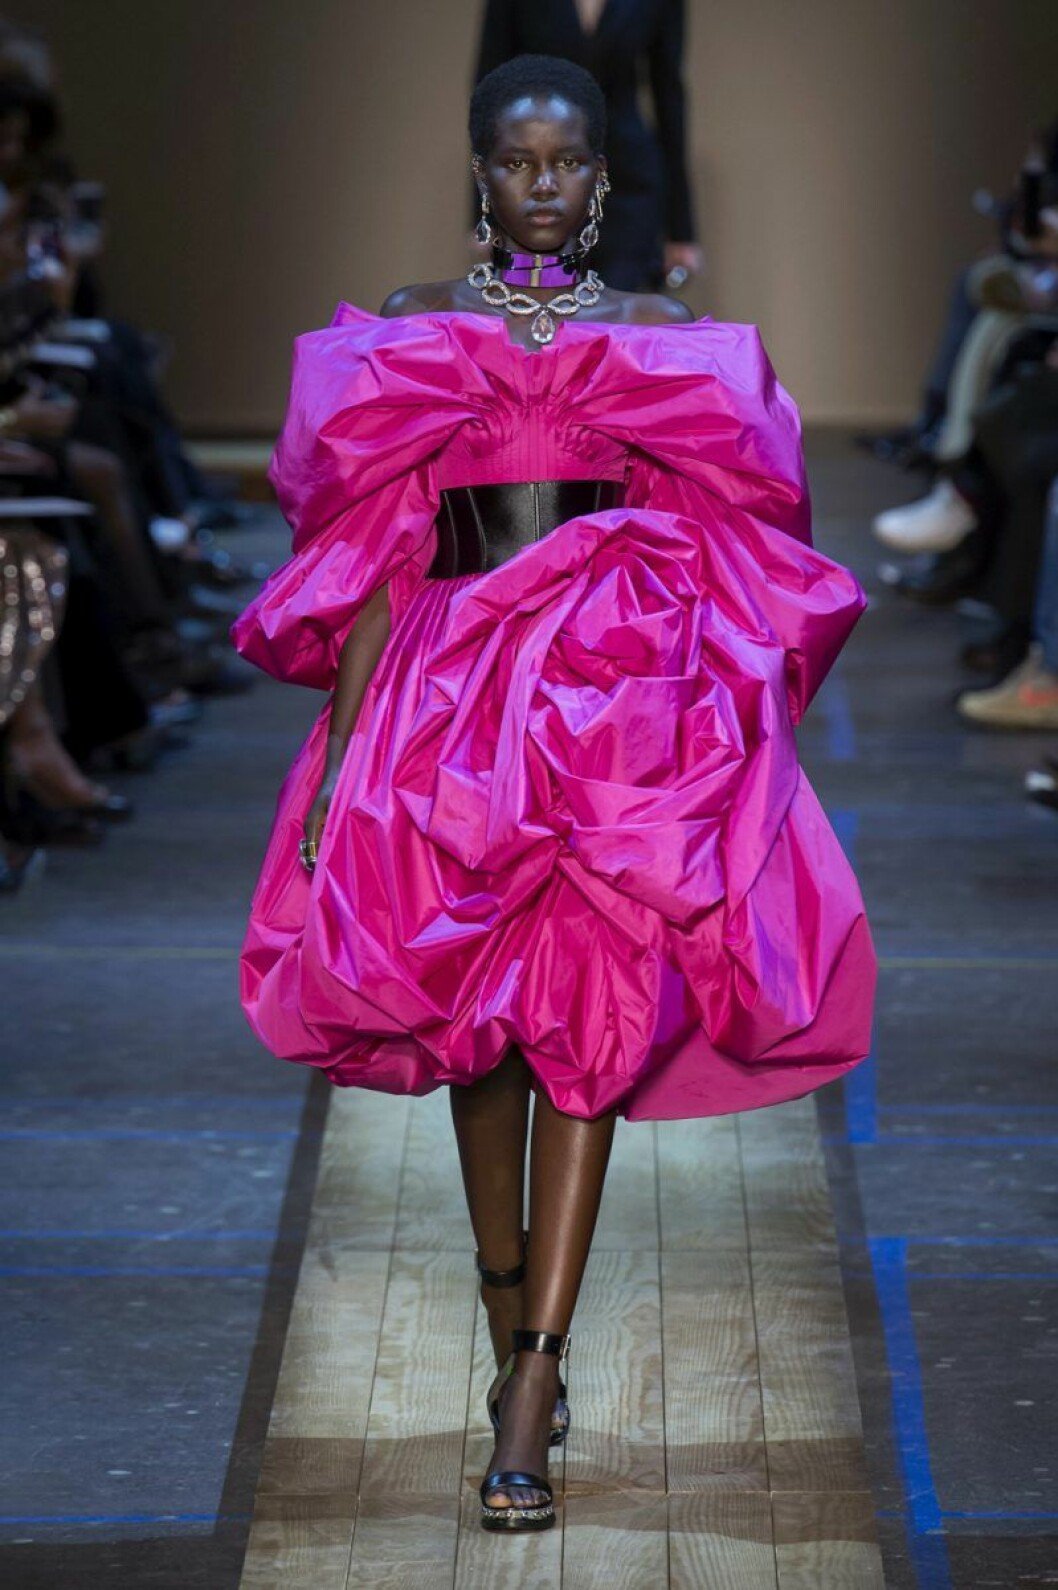 Alexander McQueen aw 19 chockrosa klänning